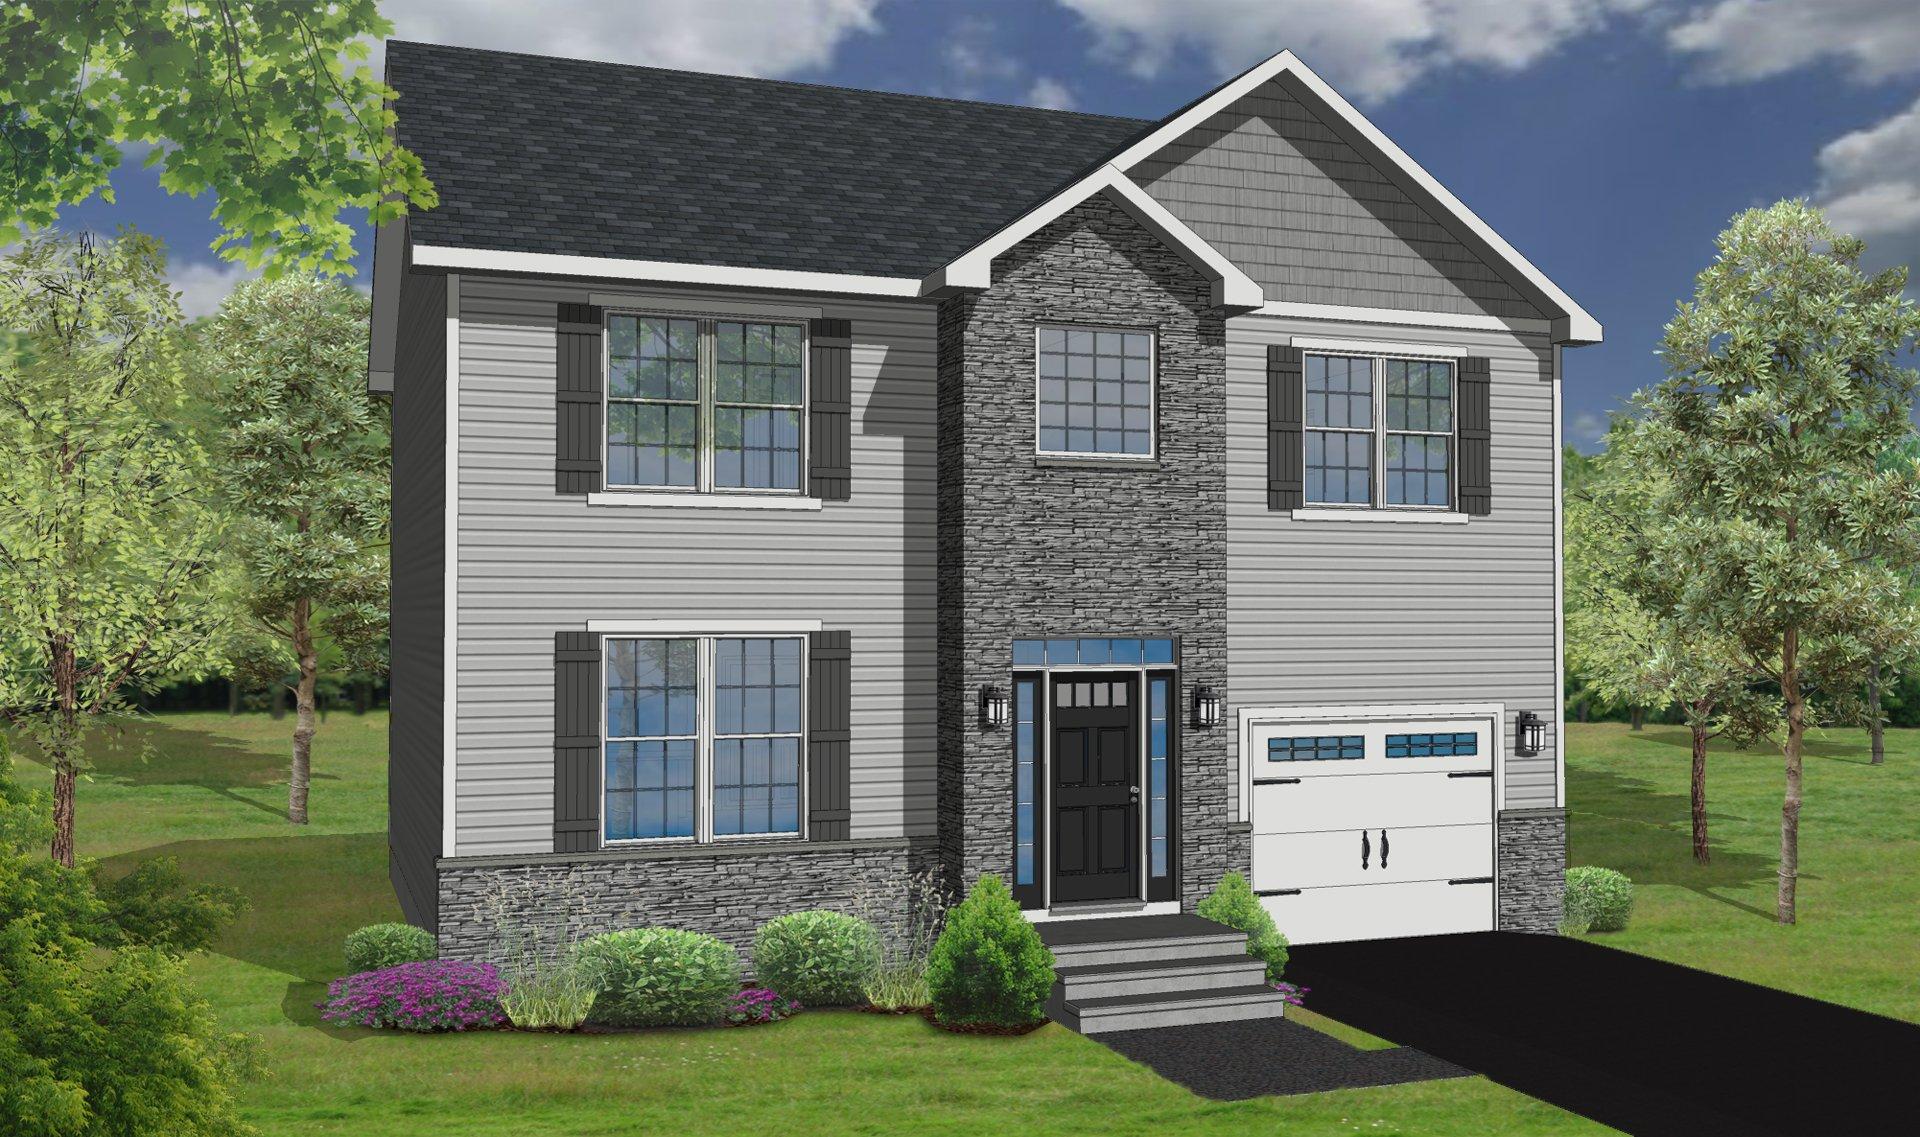 The April I Home Design Plan